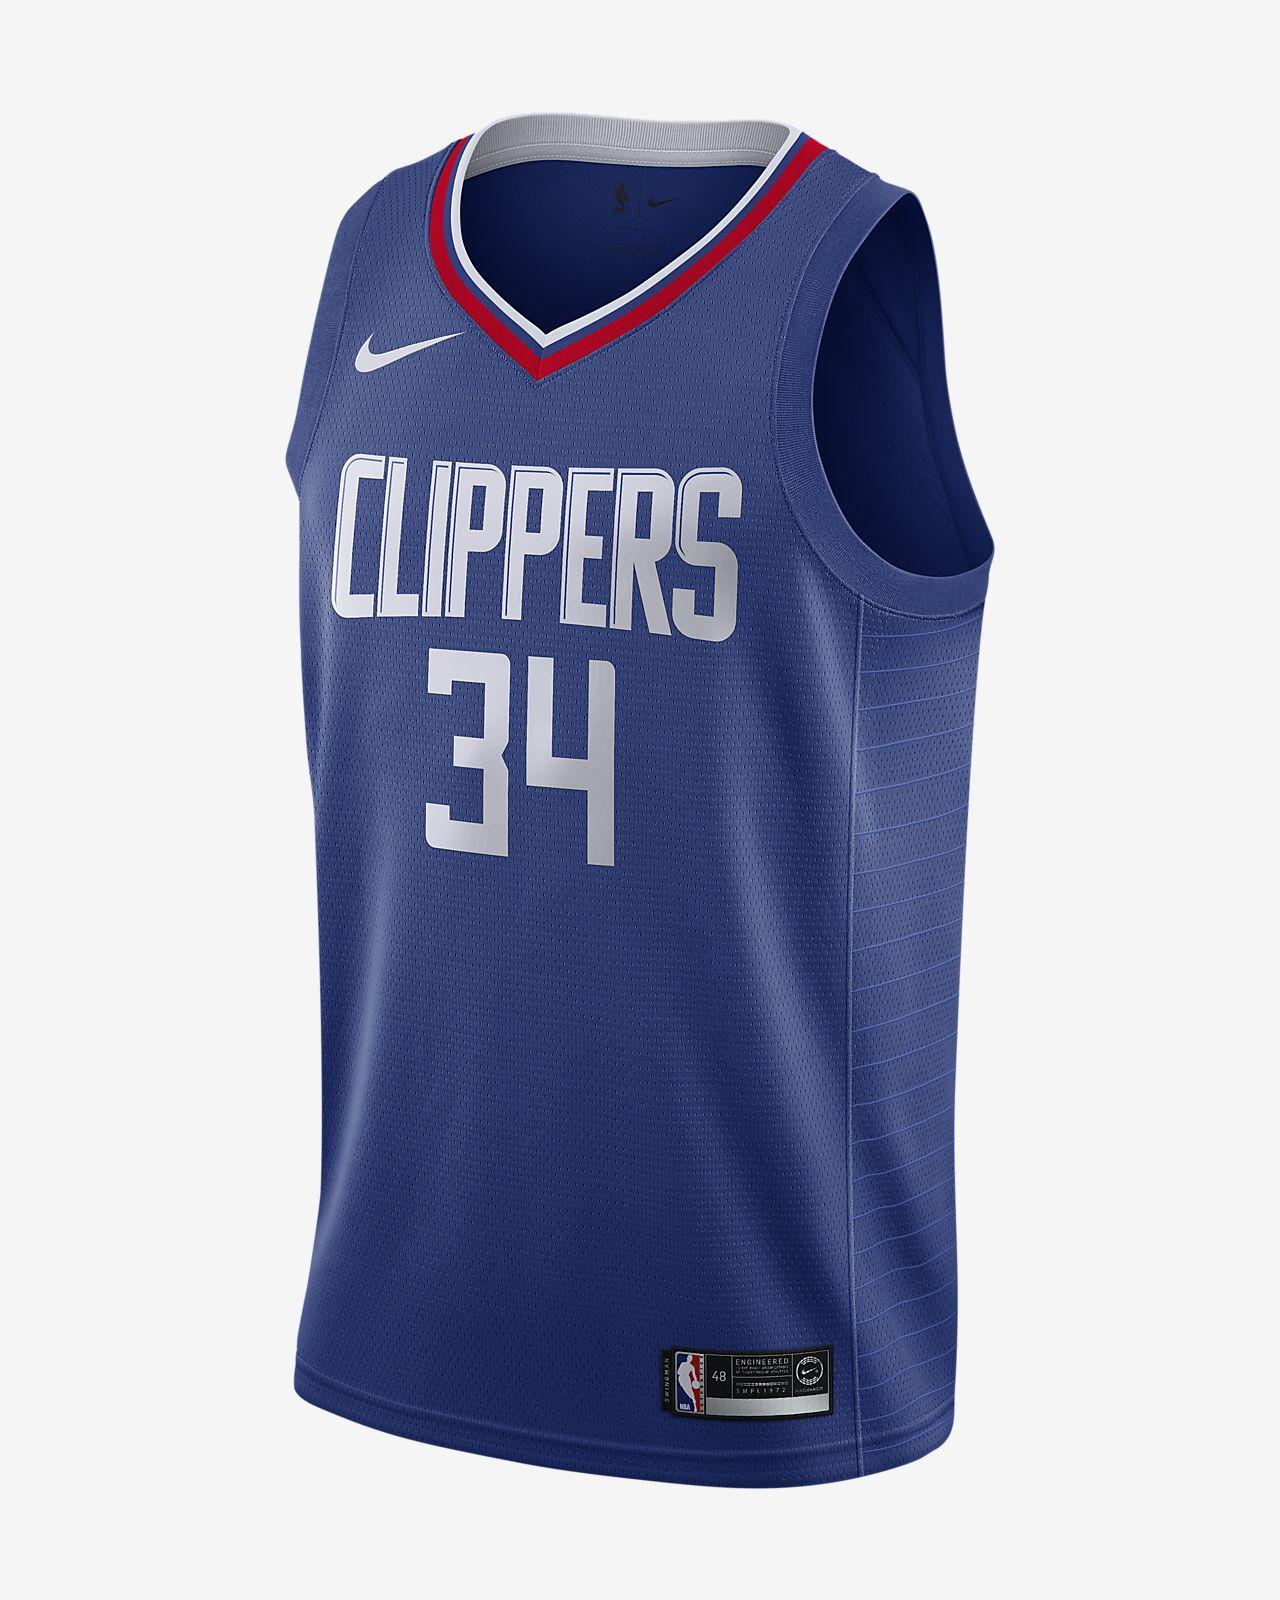 Camiseta conectada Nike NBA para hombre Tobias Harris Icon Edition Swingman (LA Clippers)